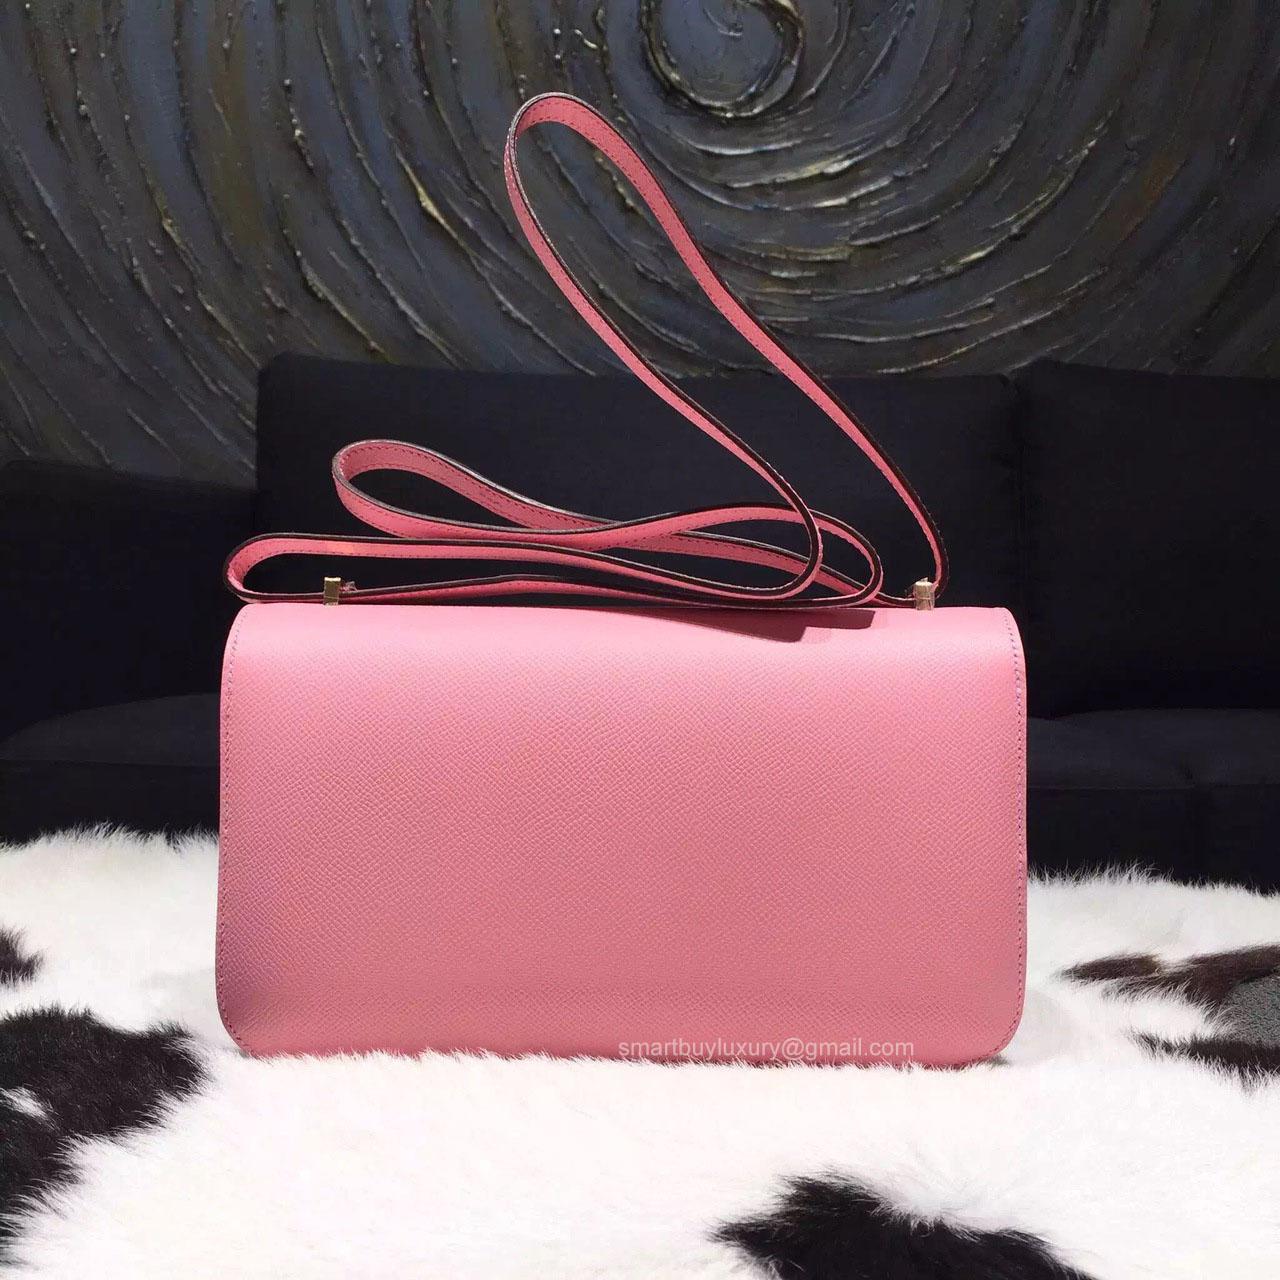 hermes kelly birkin bag - Hermes Constance Elan 25 Bag Rose Confetti 1Q Epsom Leather ...